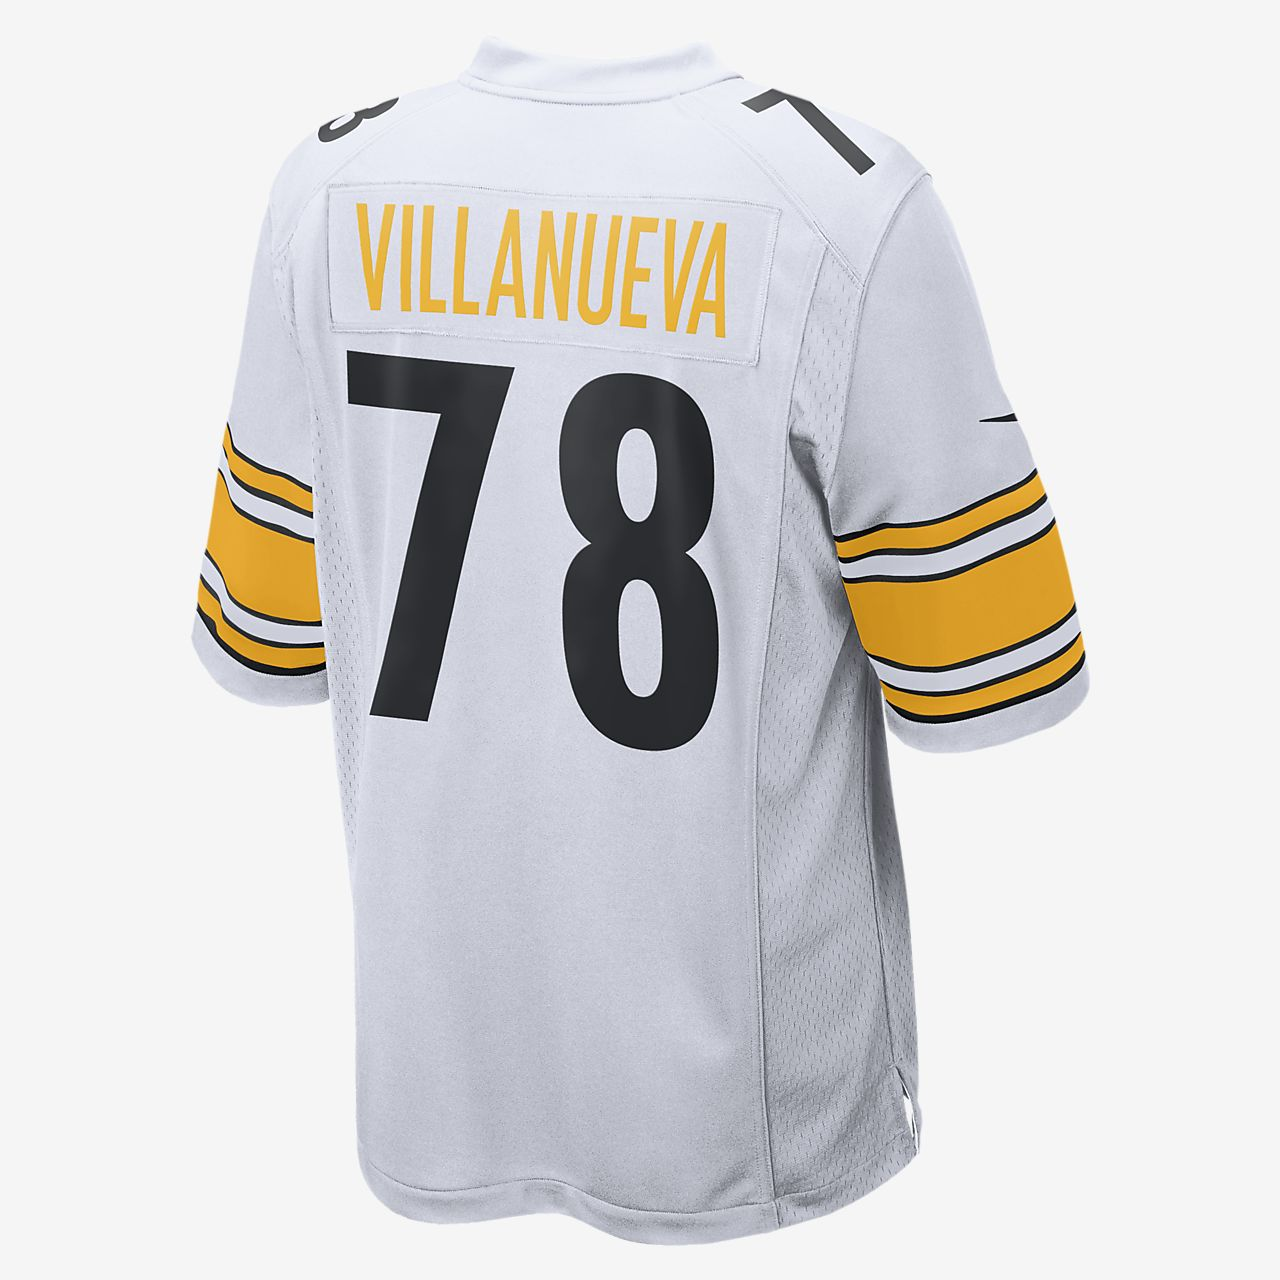 info for 08e25 39e2c NFL Pittsburgh Steelers (Alejandro Villanueva) Men's Football Away Game  Jersey